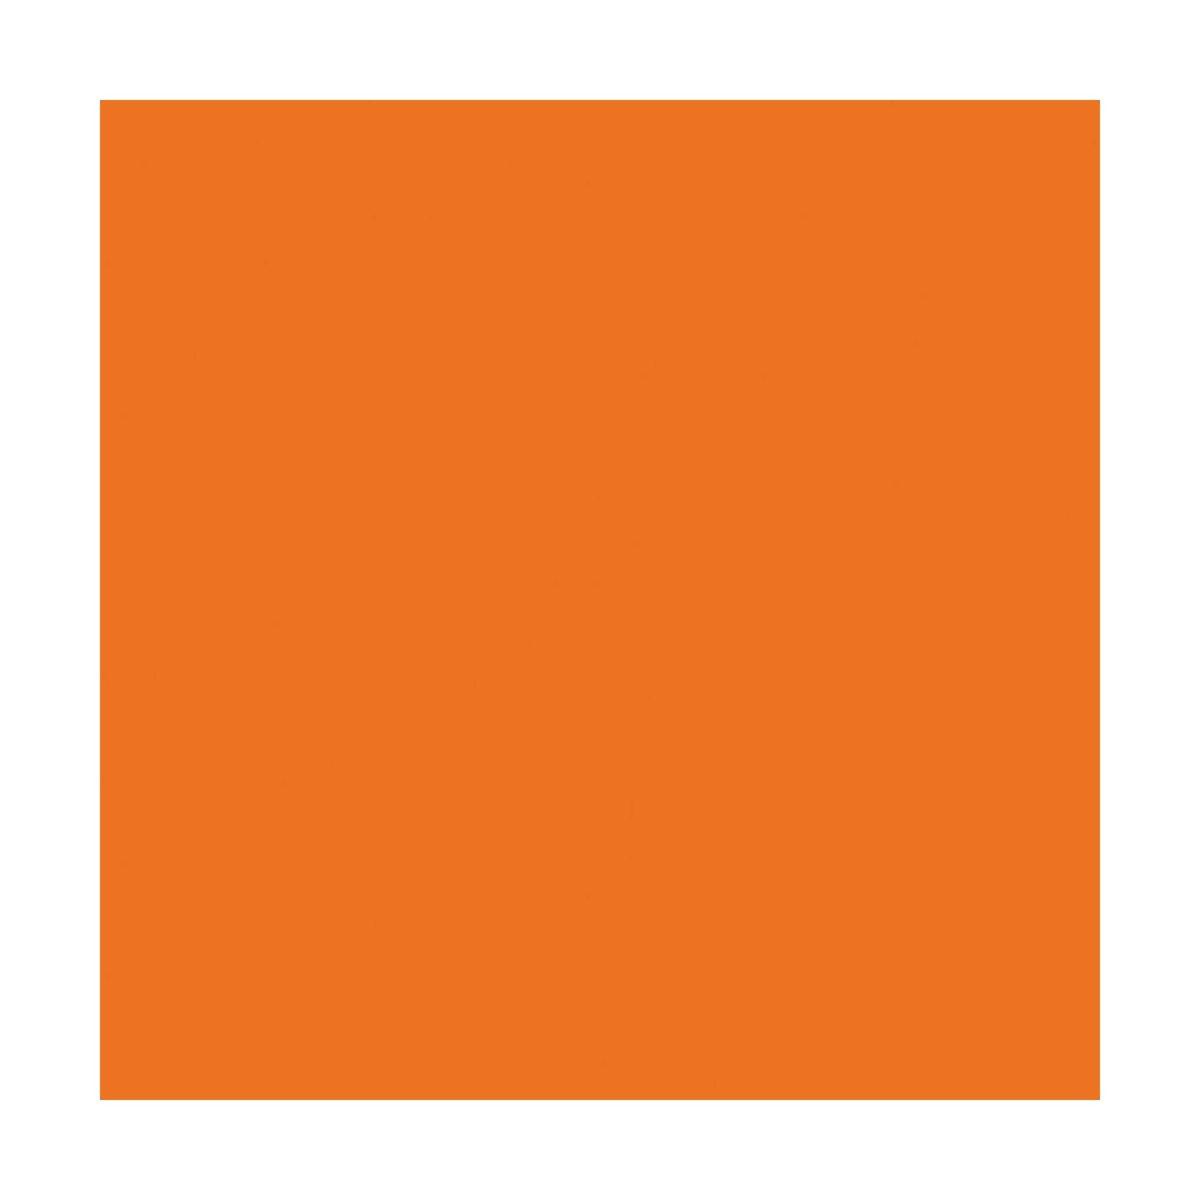 bd_backgrounds_152_tangerine_02